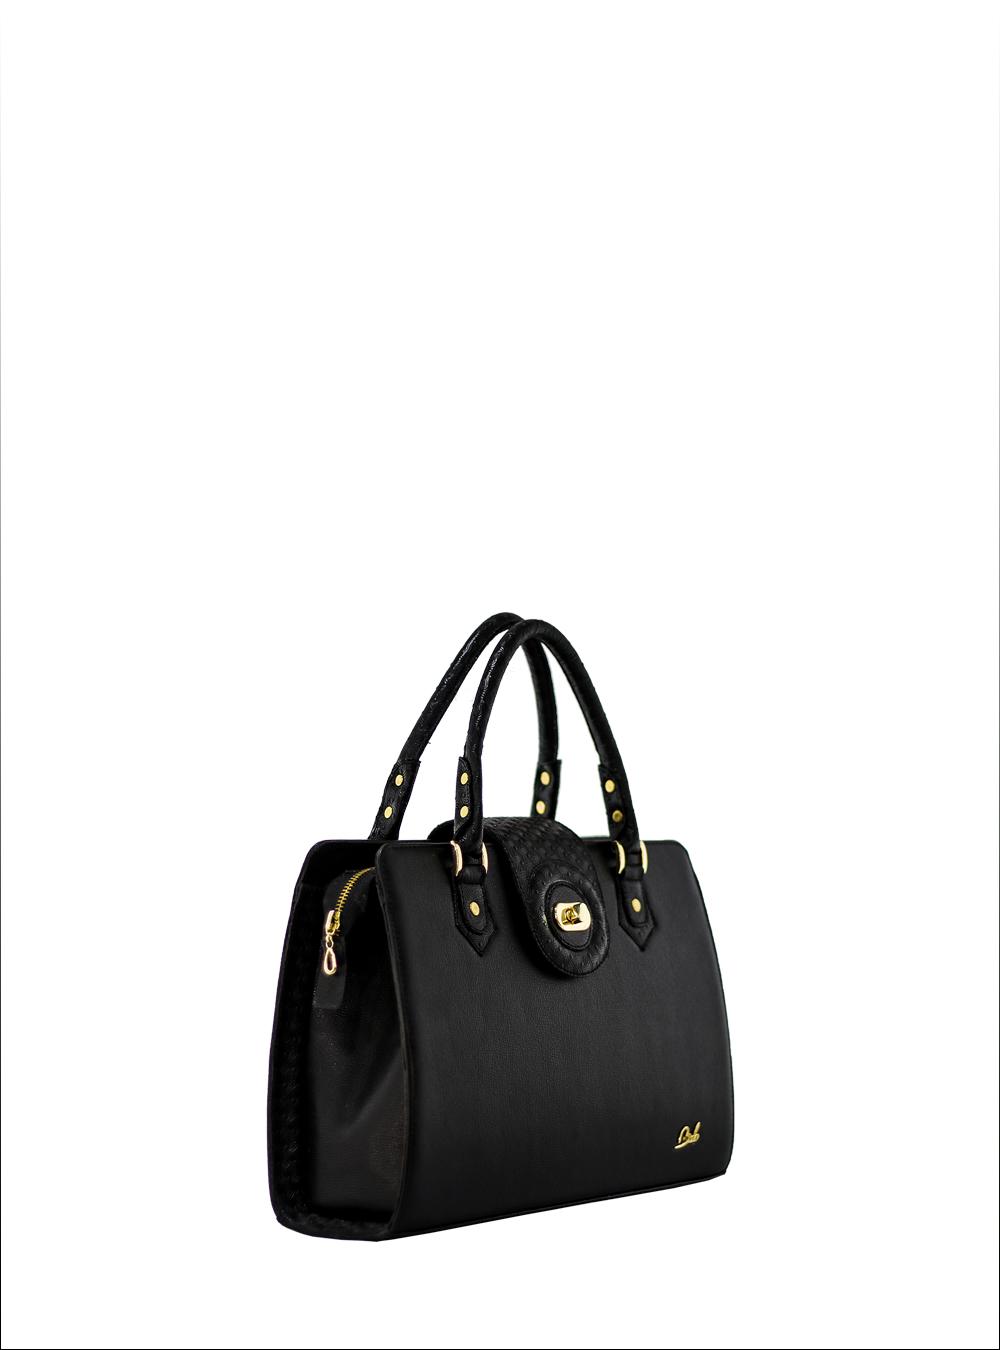 54d95cd746e6 bags Store Antonela black leather handbag · handbags  antonella  tote